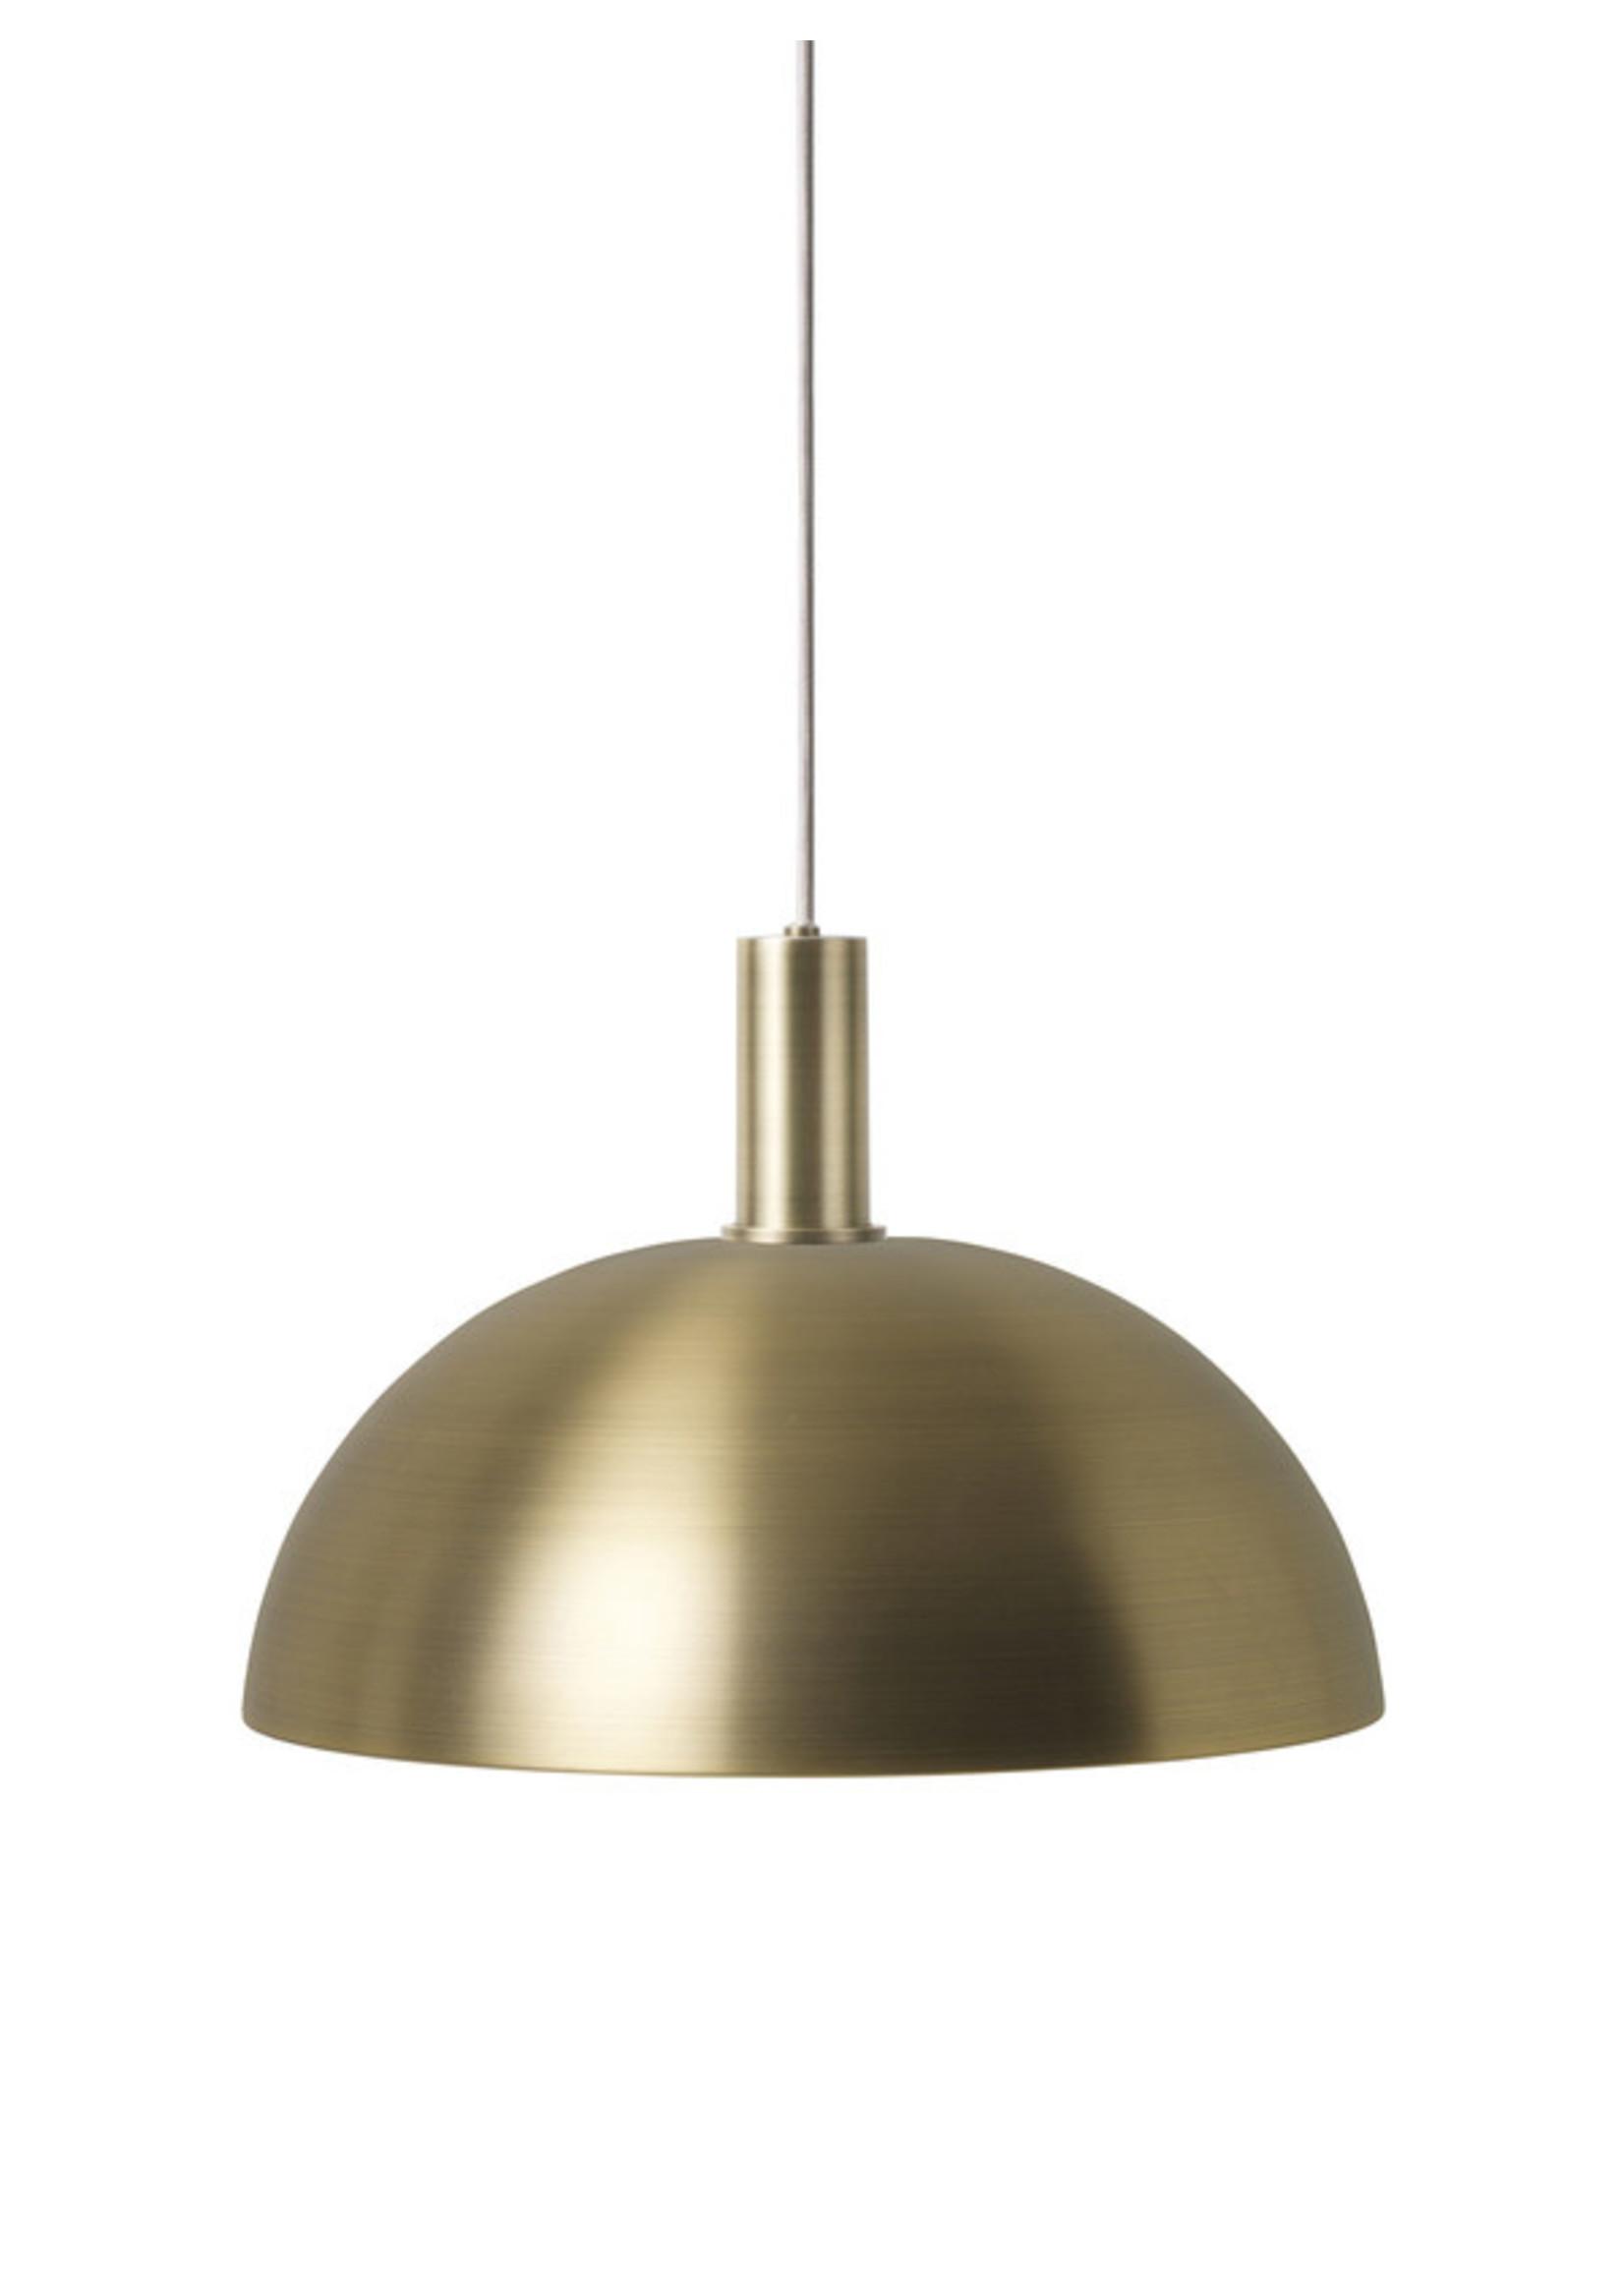 ferm LIVING ferm LIVING Lighting - Socket Pendant Low - Brass